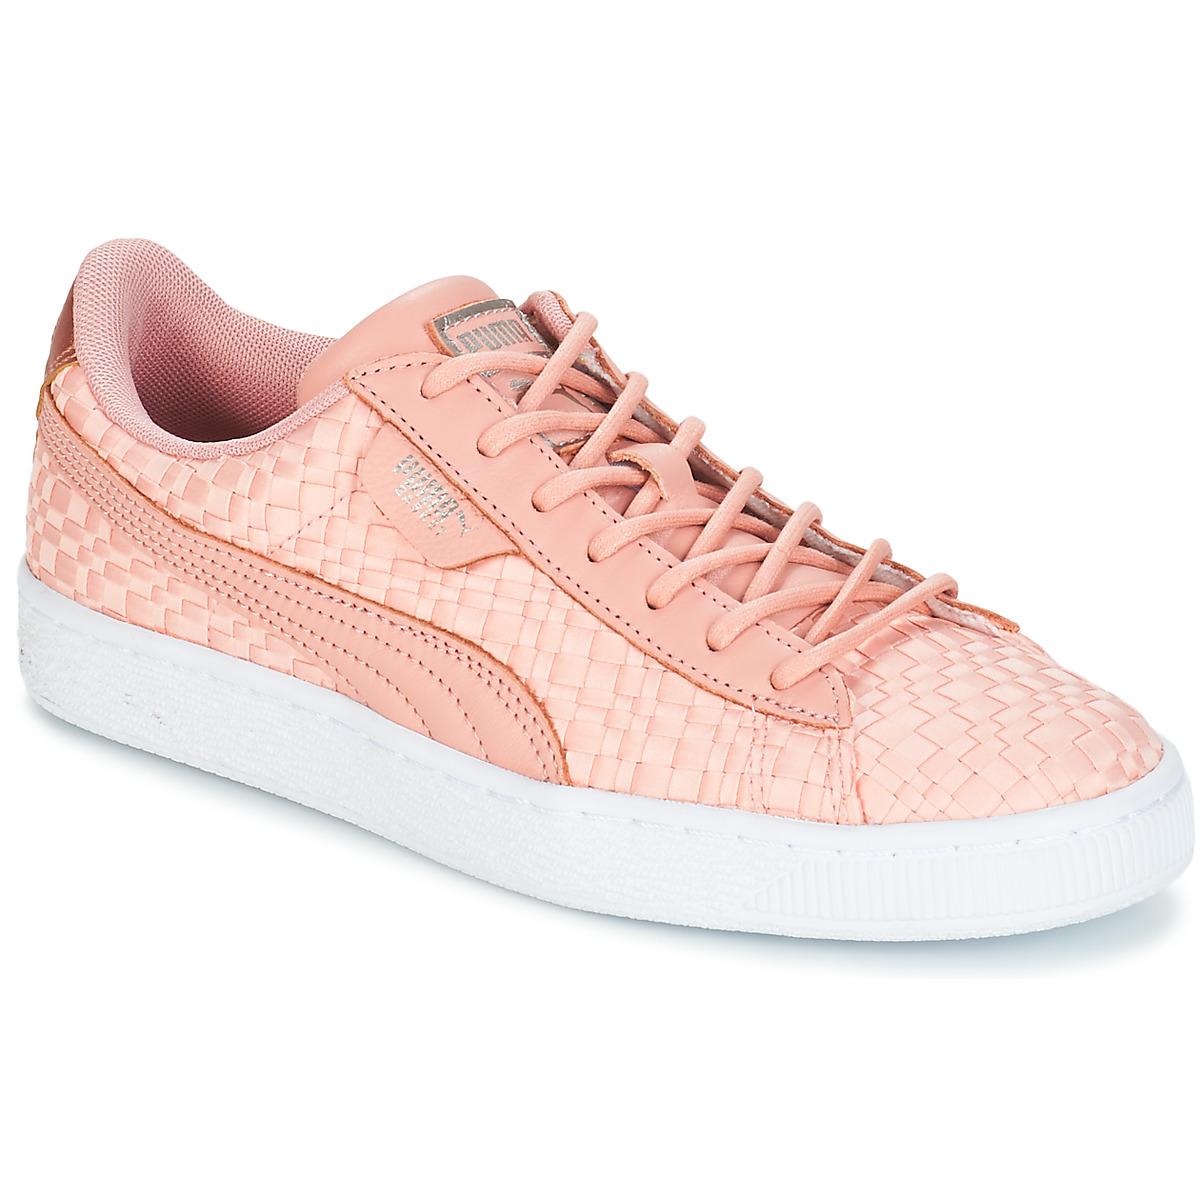 9d824abafbb733 ... Puma BASKET SATIN EP WN S Pfirsisch - Kostenloser Versand bei Spartoode  ! - Schuhe Sneaker Low Nike ...